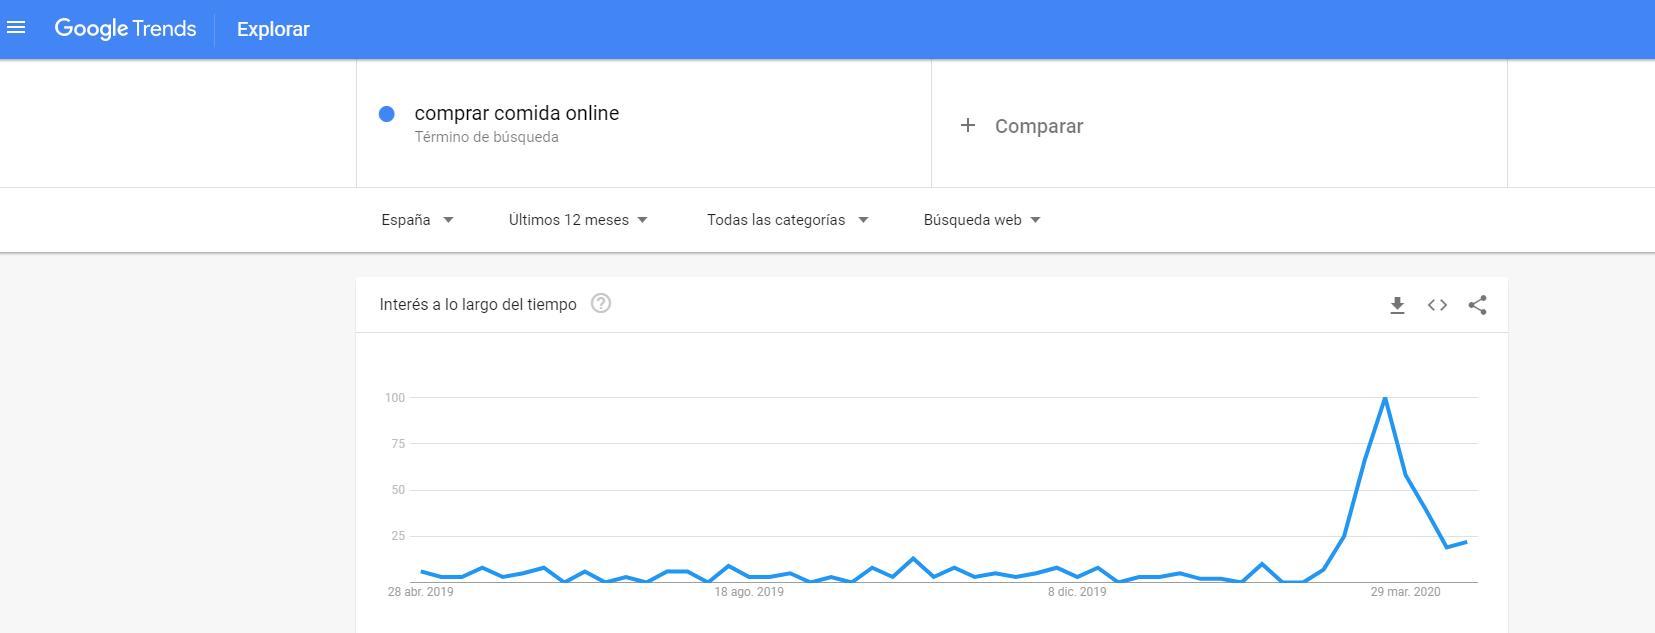 google trends comprar comida online